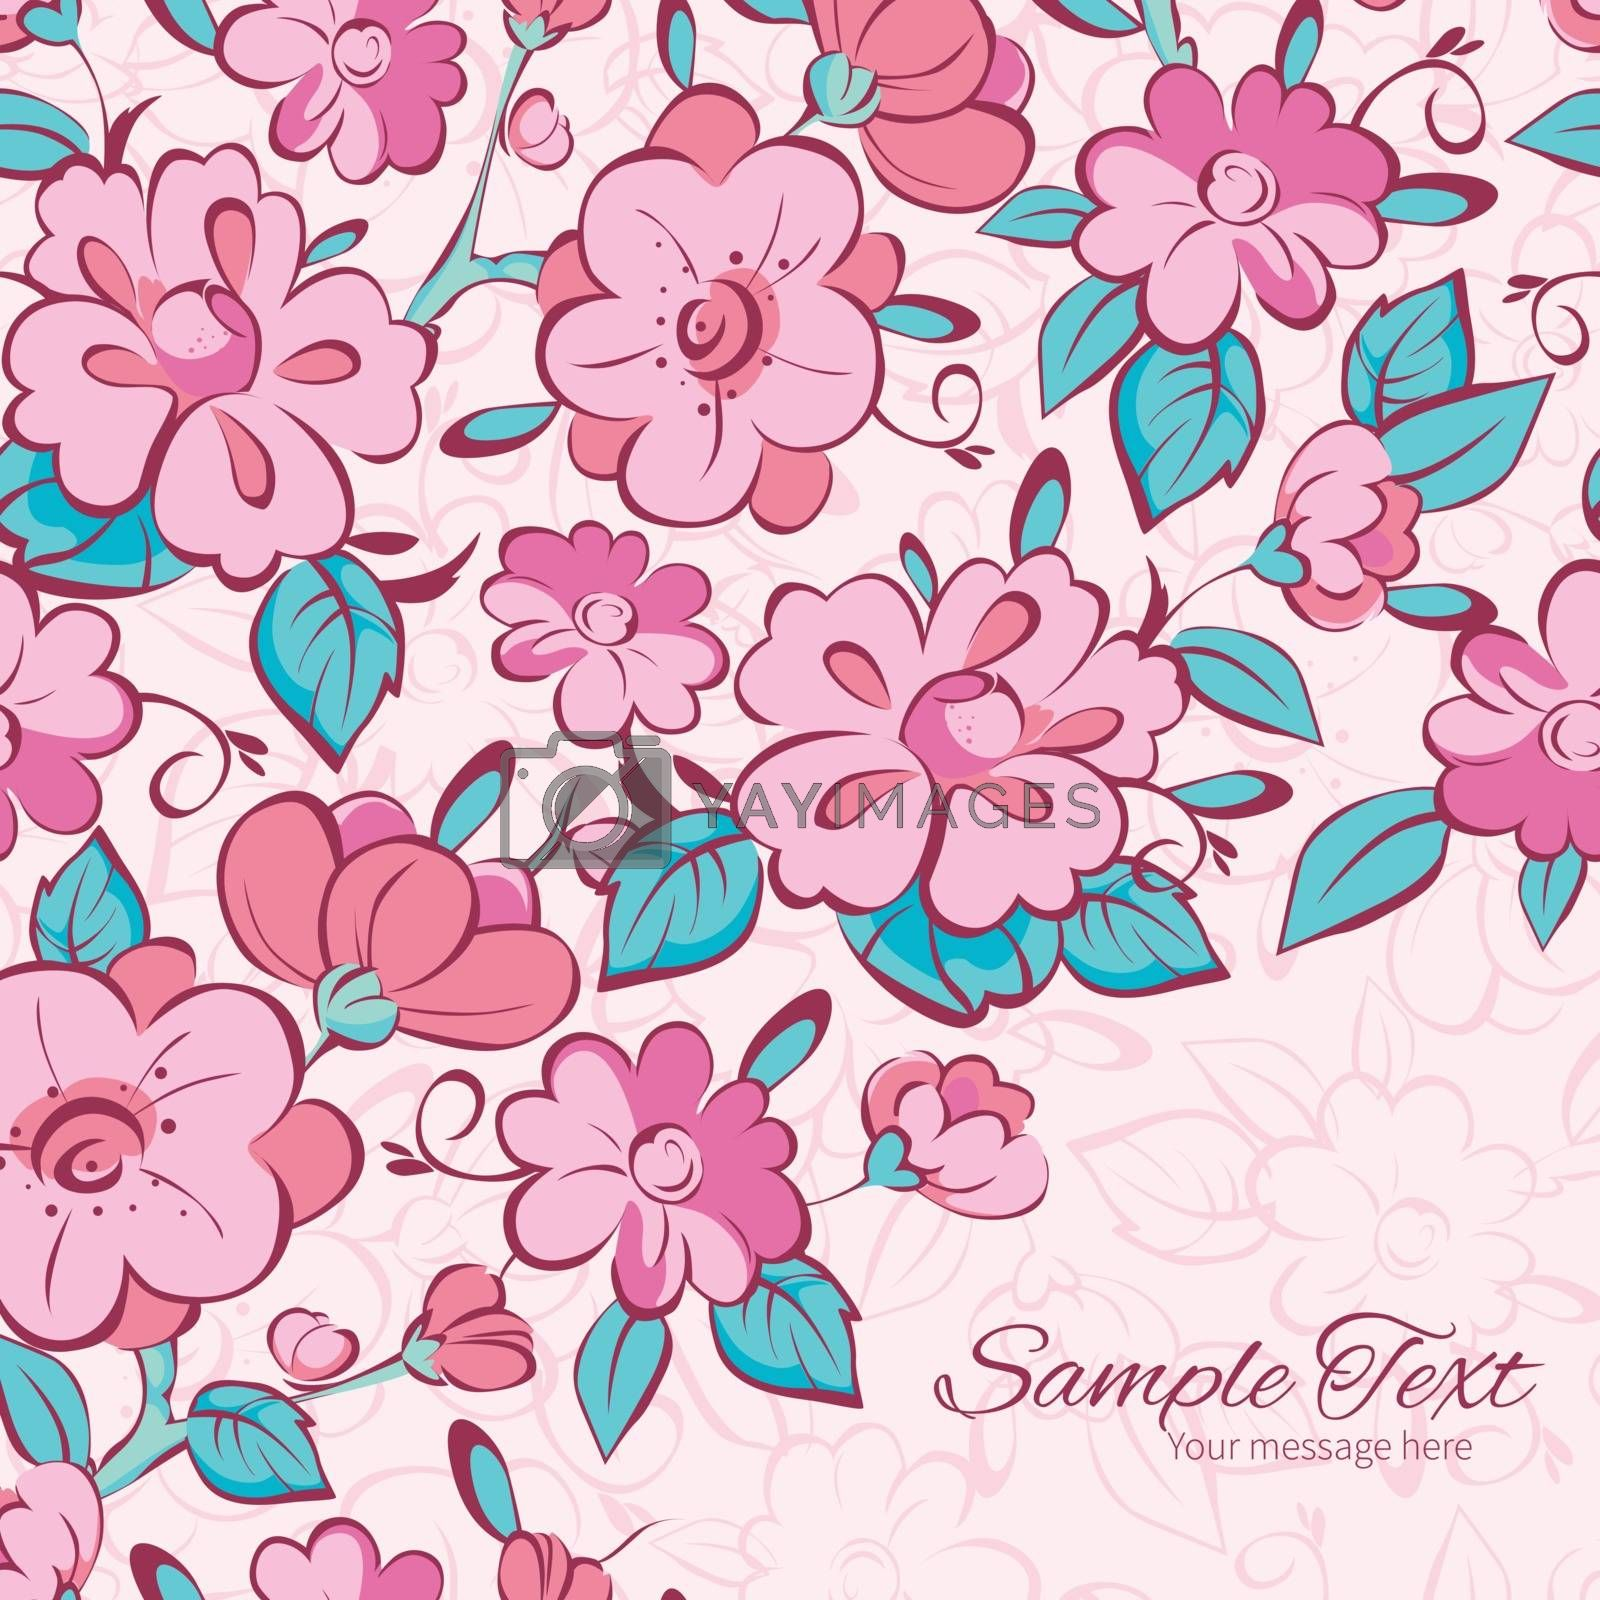 Vector pink blue kimono flowers frame corner pattern background graphic design